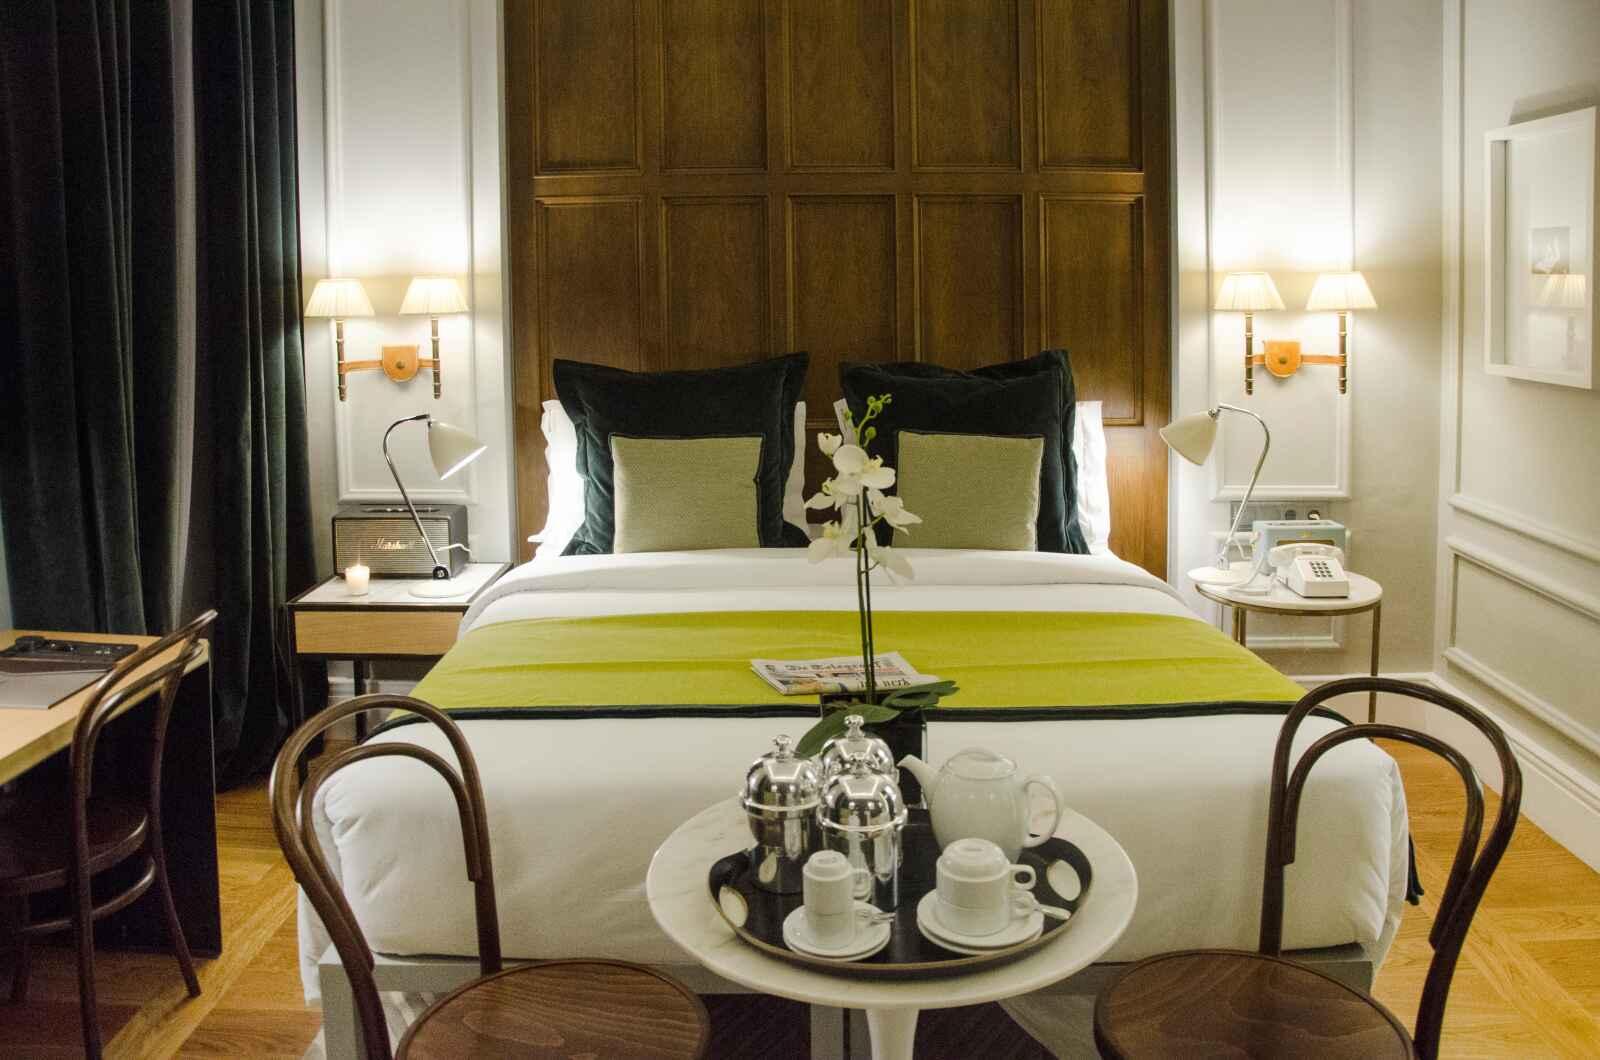 Séjour Portugal - Brown's Central Hotel - Lisbonne - 4*